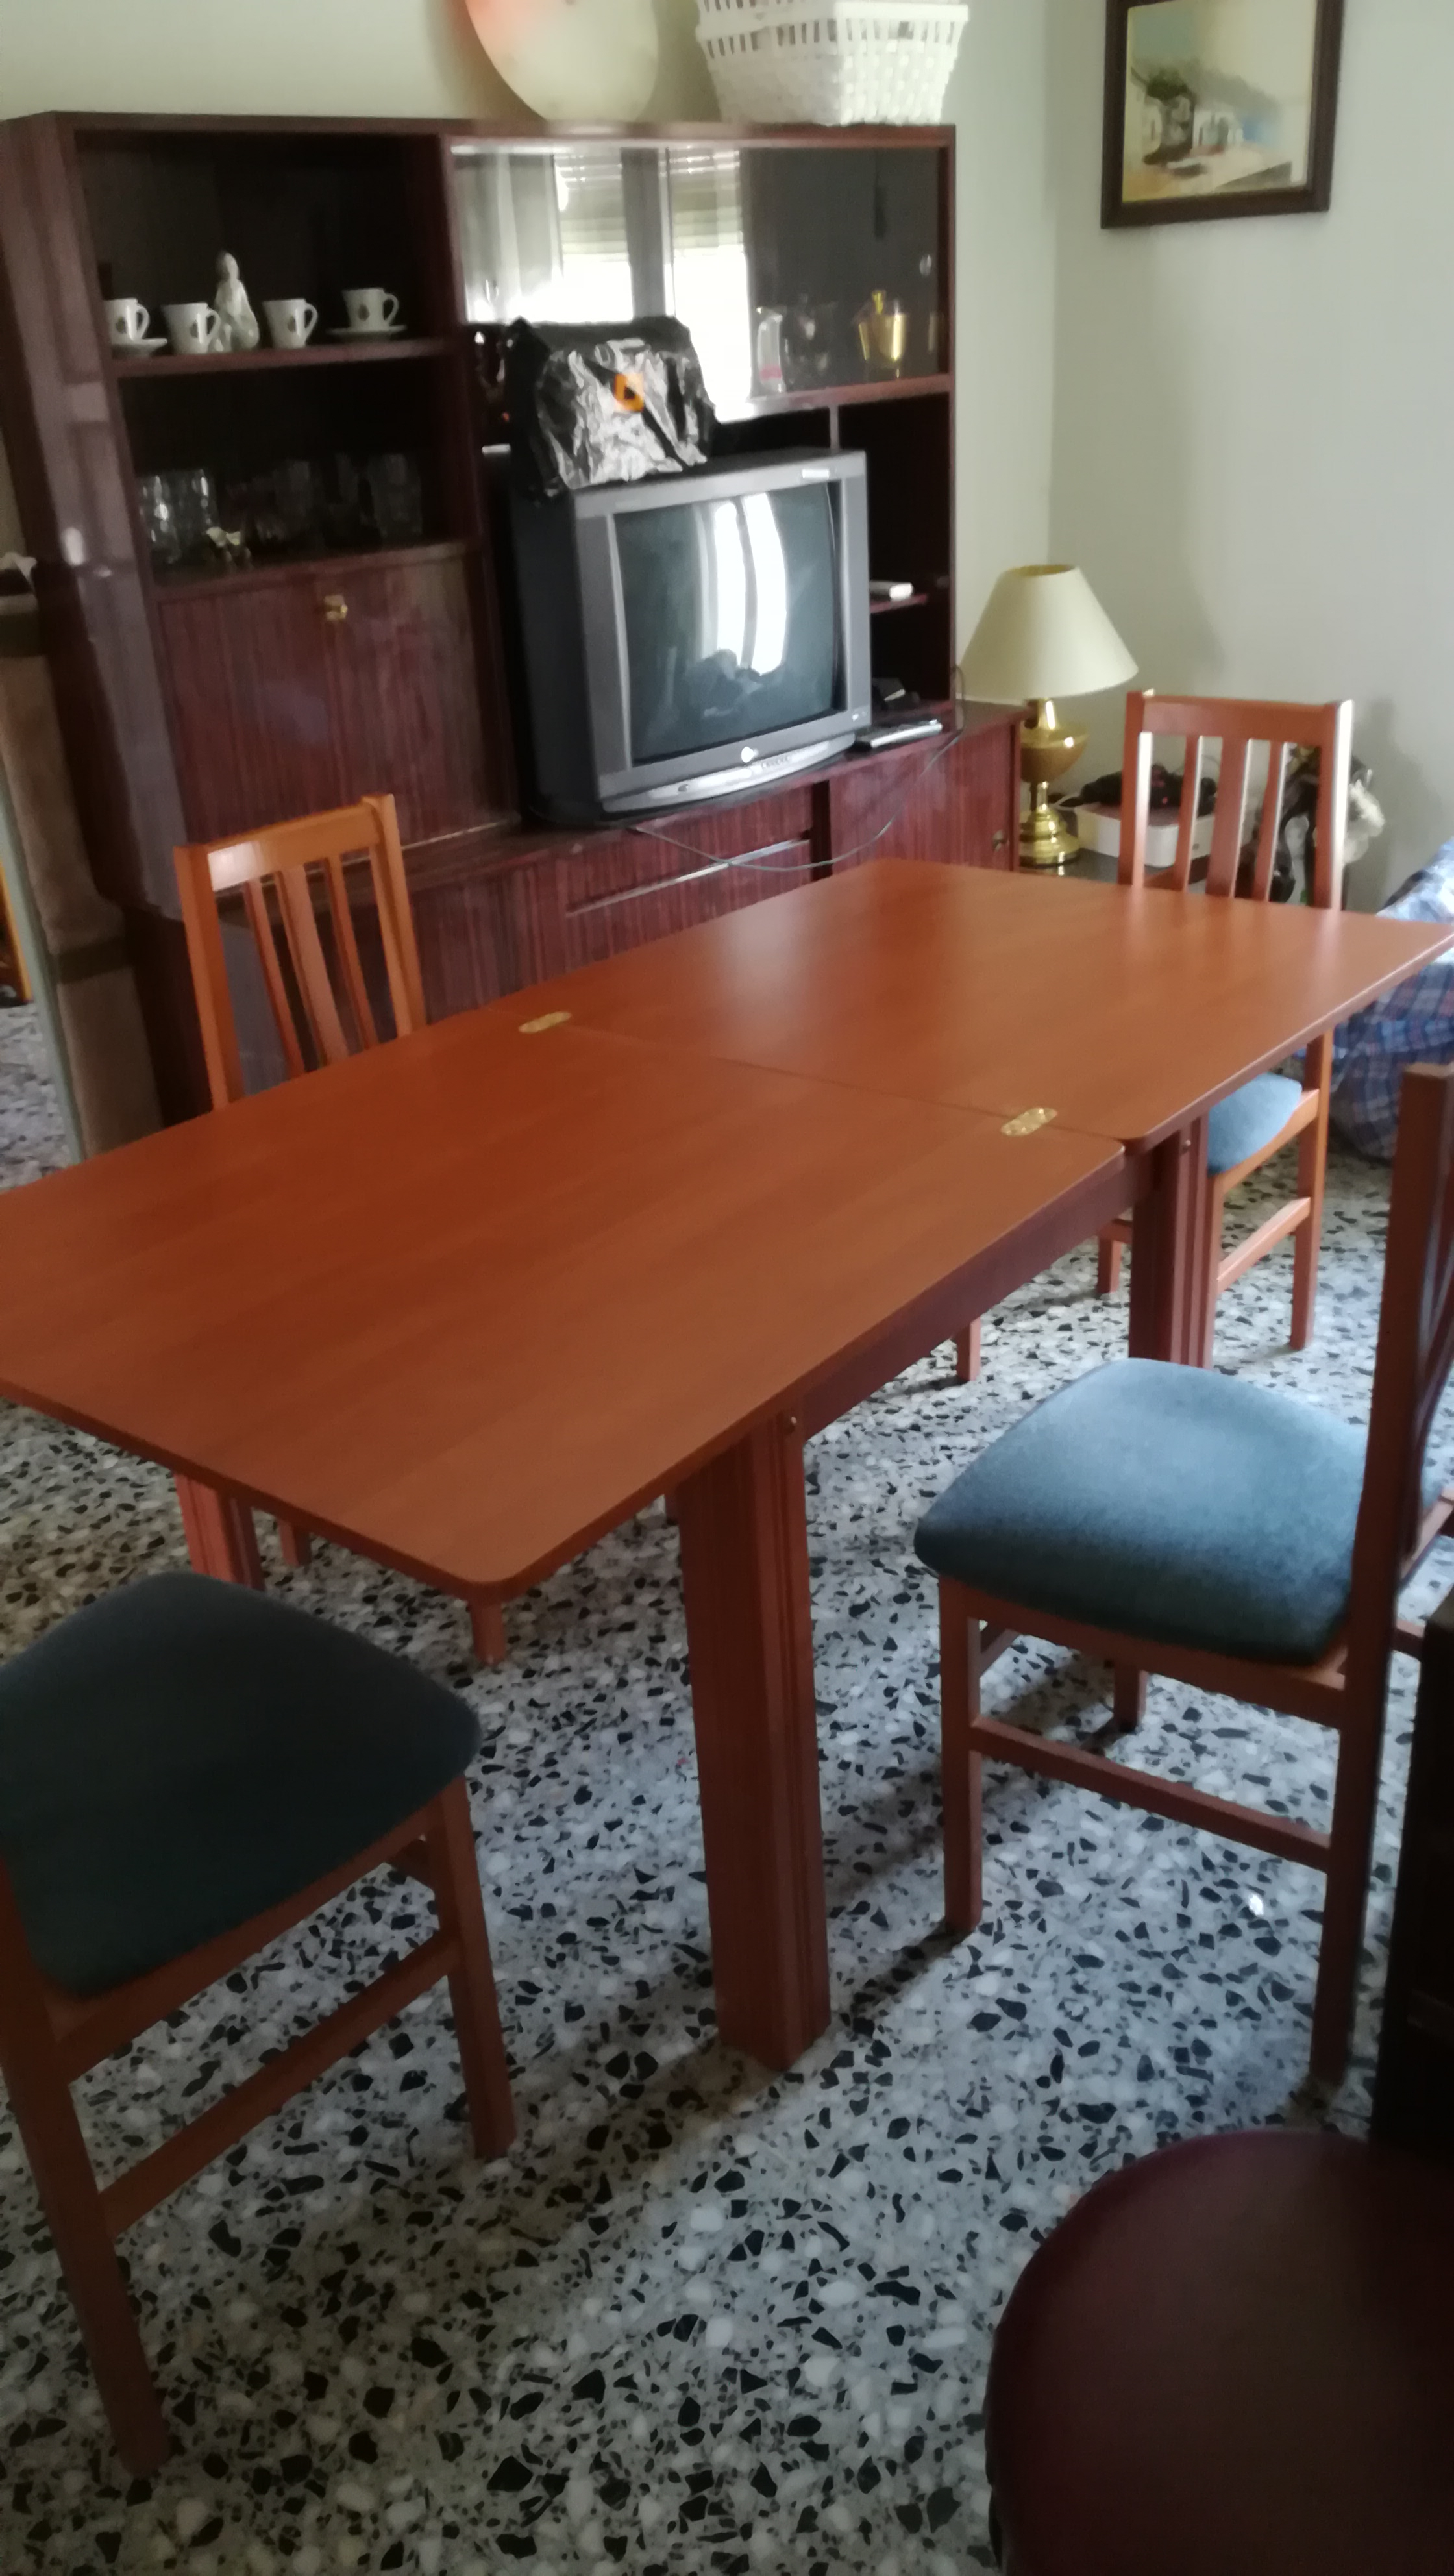 Kitchen housewares donation - Where to buy things in Elda - Elda ...